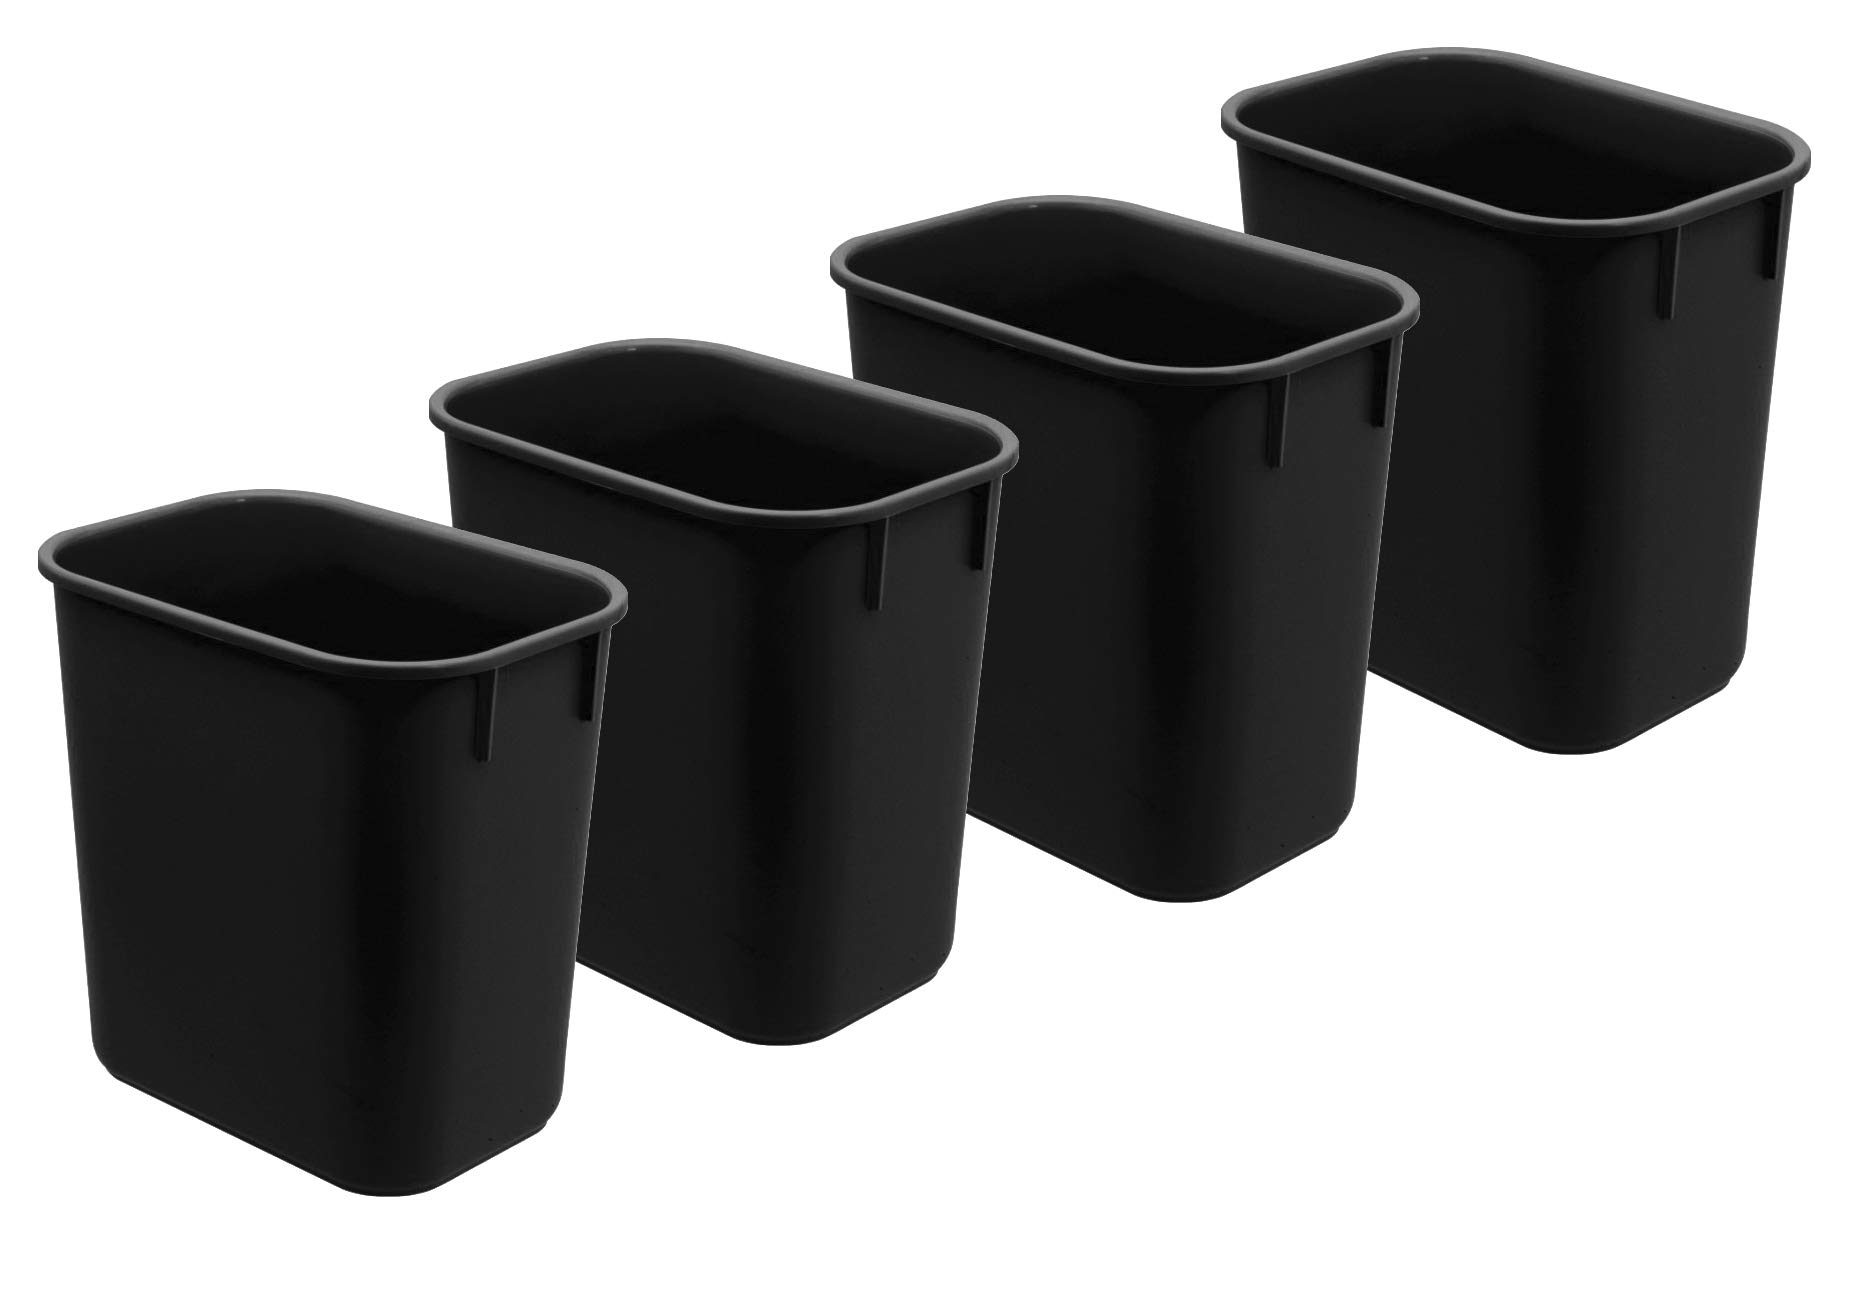 Acrimet Wastebasket 13QT (4 - Pack) (Black Color) by Acrimet